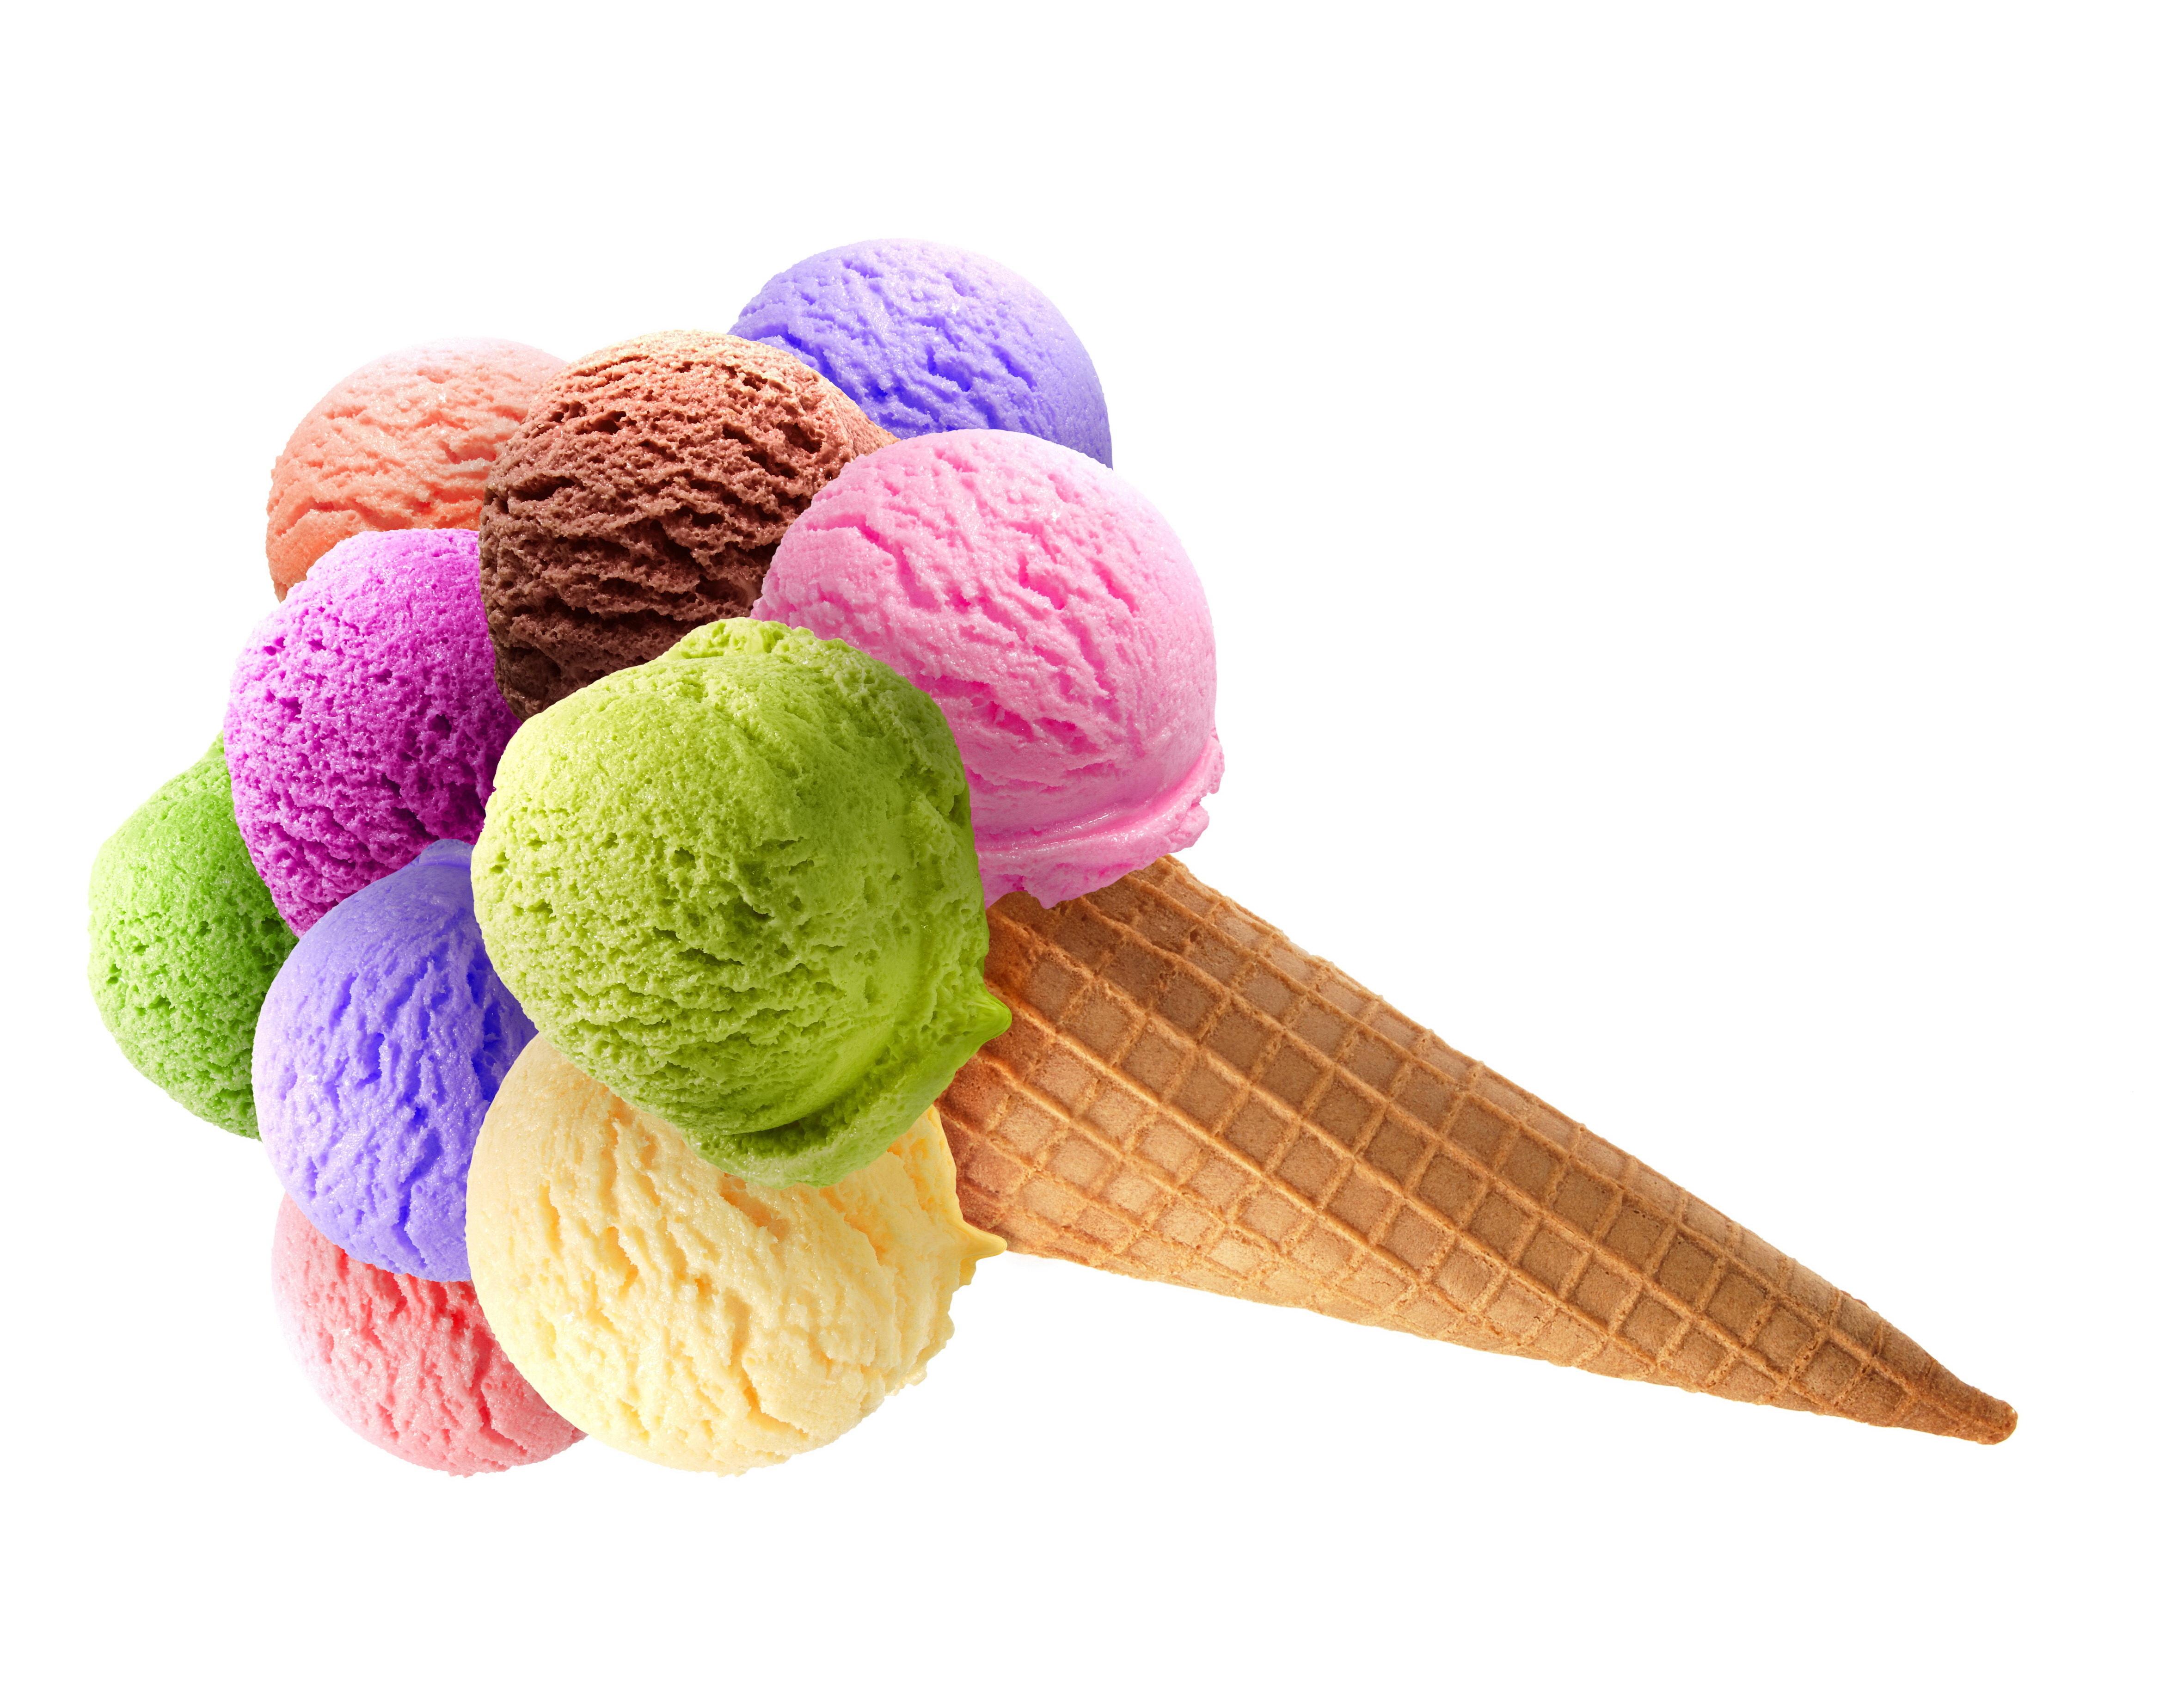 объектива открывается, мороженое на белом фоне фото итоге